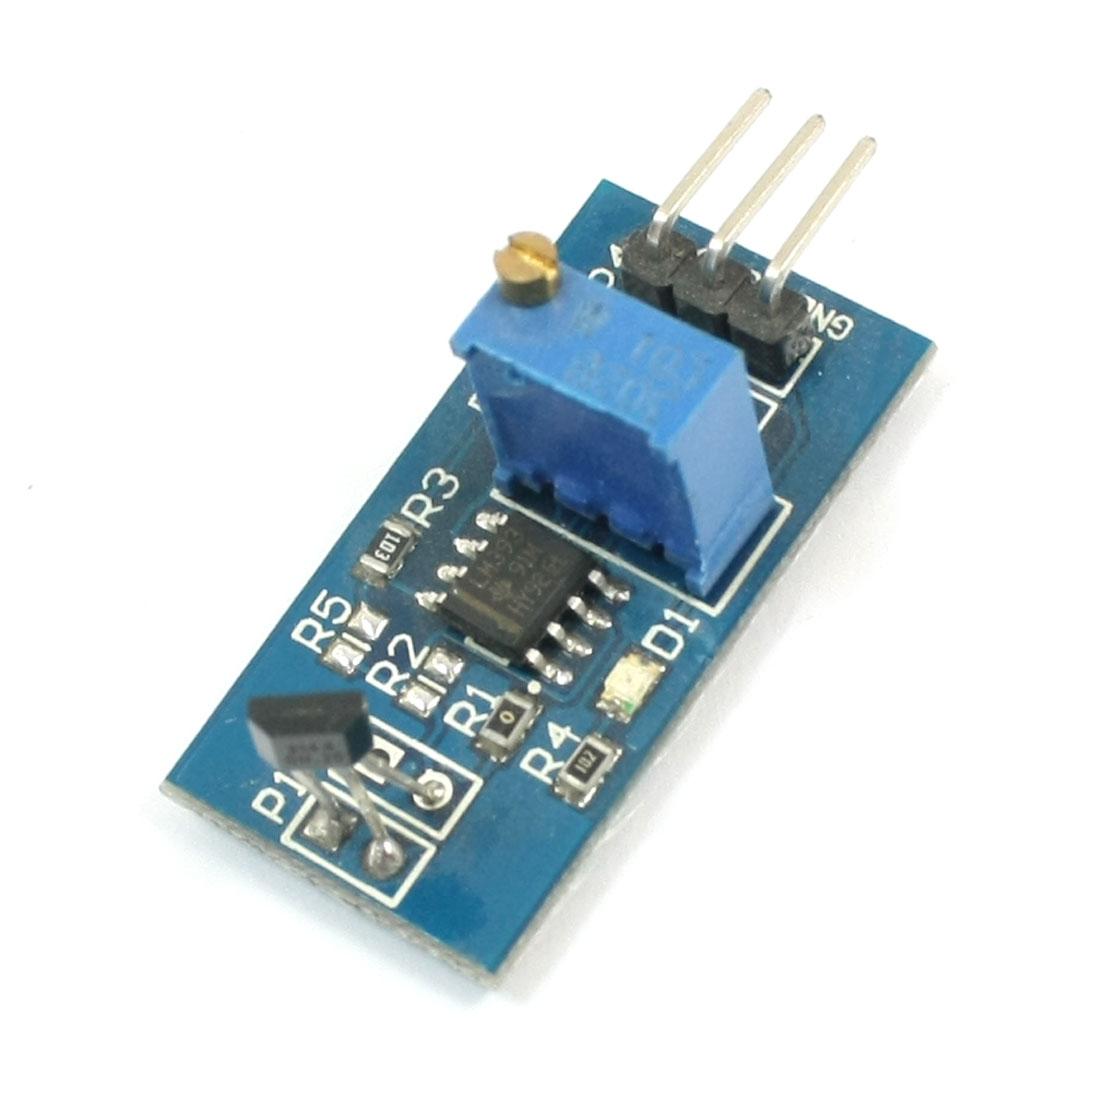 Smart Car Speed Detector LM393 3144 Hall Switch Sensor Module DC 5V